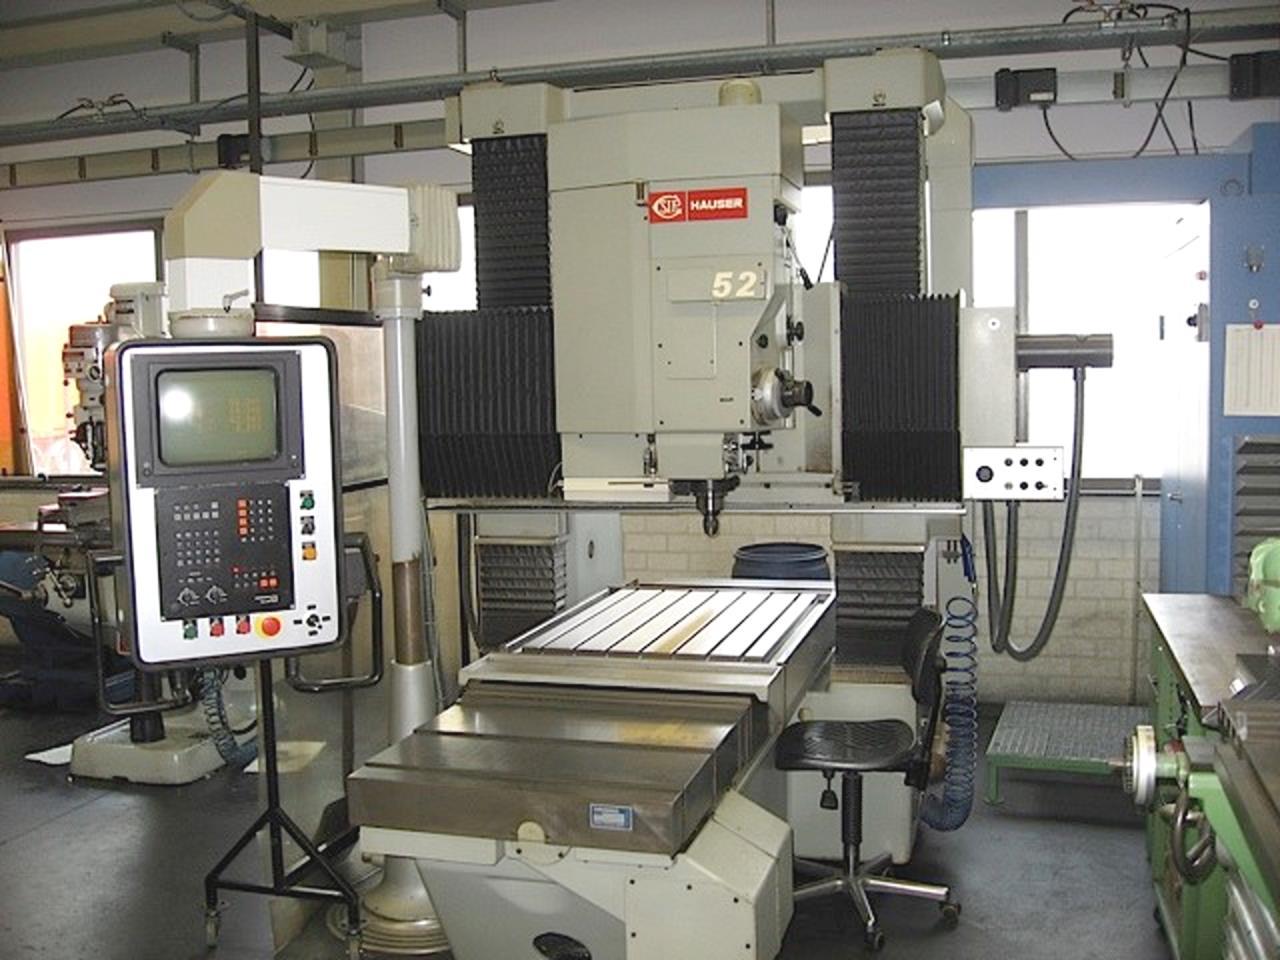 SIP/HAUSER MP 52数控钻模机坐标镗床二手的从瑞士到国内的手续